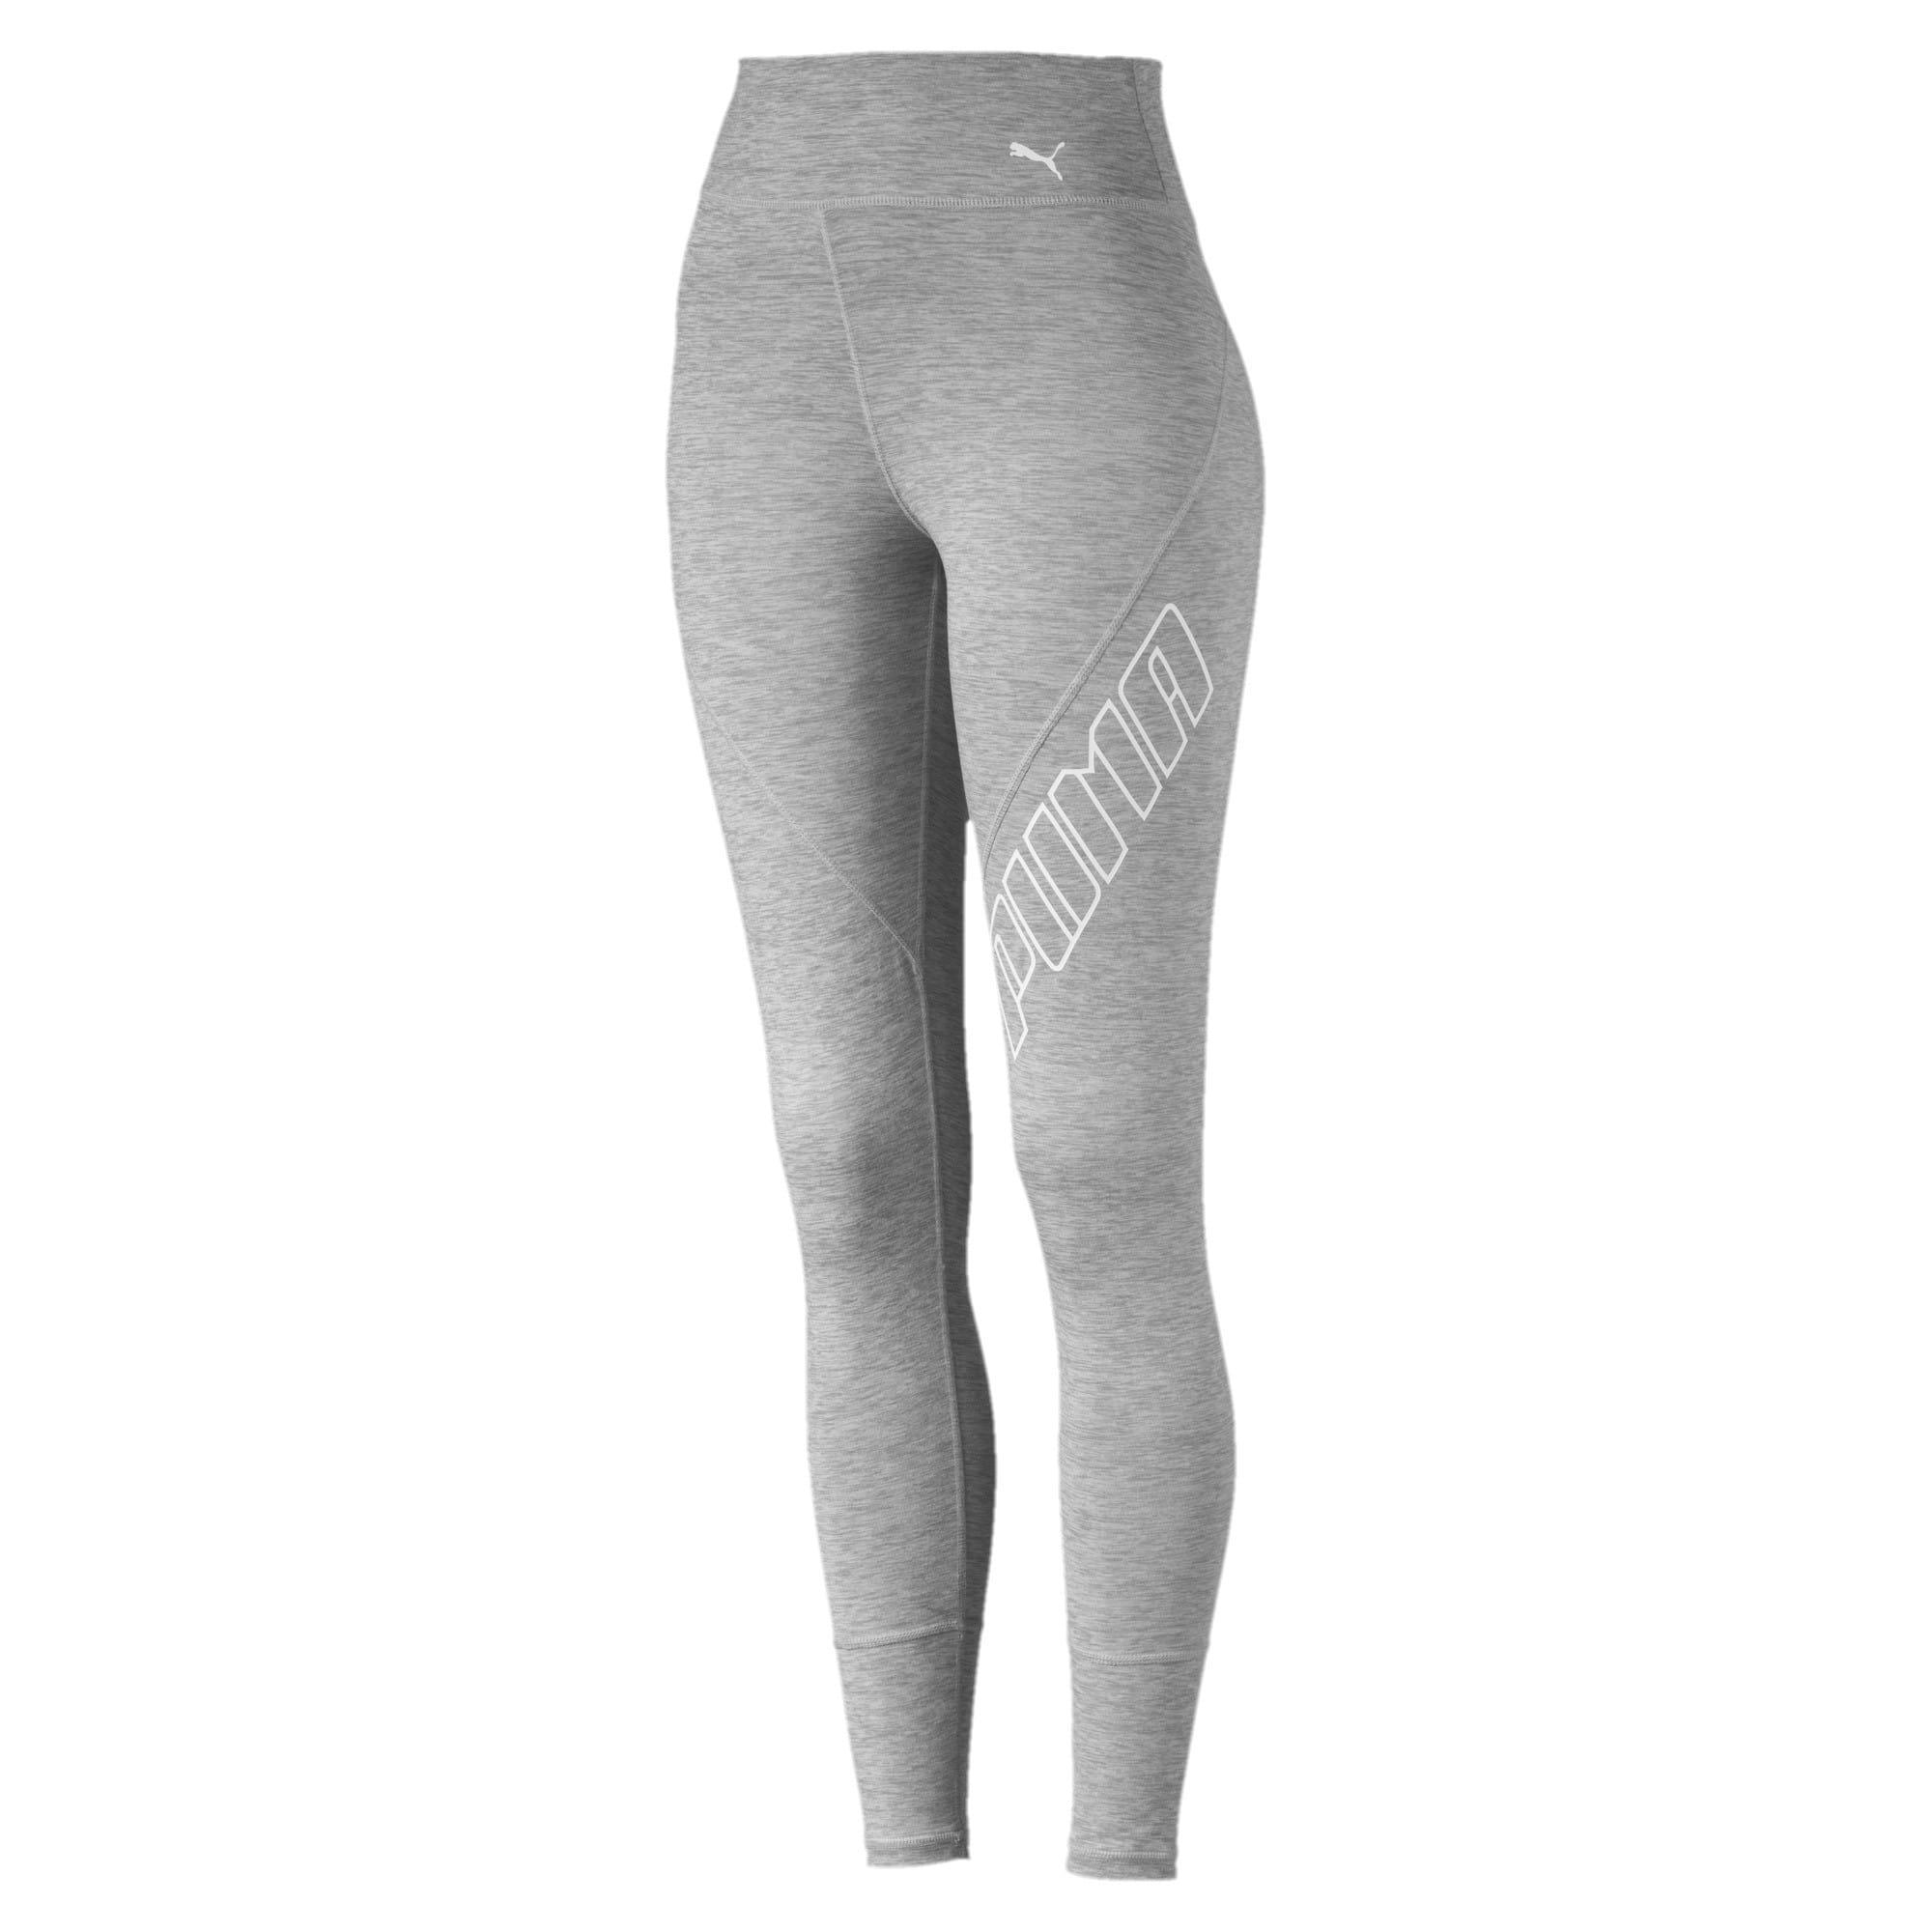 Thumbnail 1 of Yogini Logo Women's 7/8 Leggings, Light Gray Heather, medium